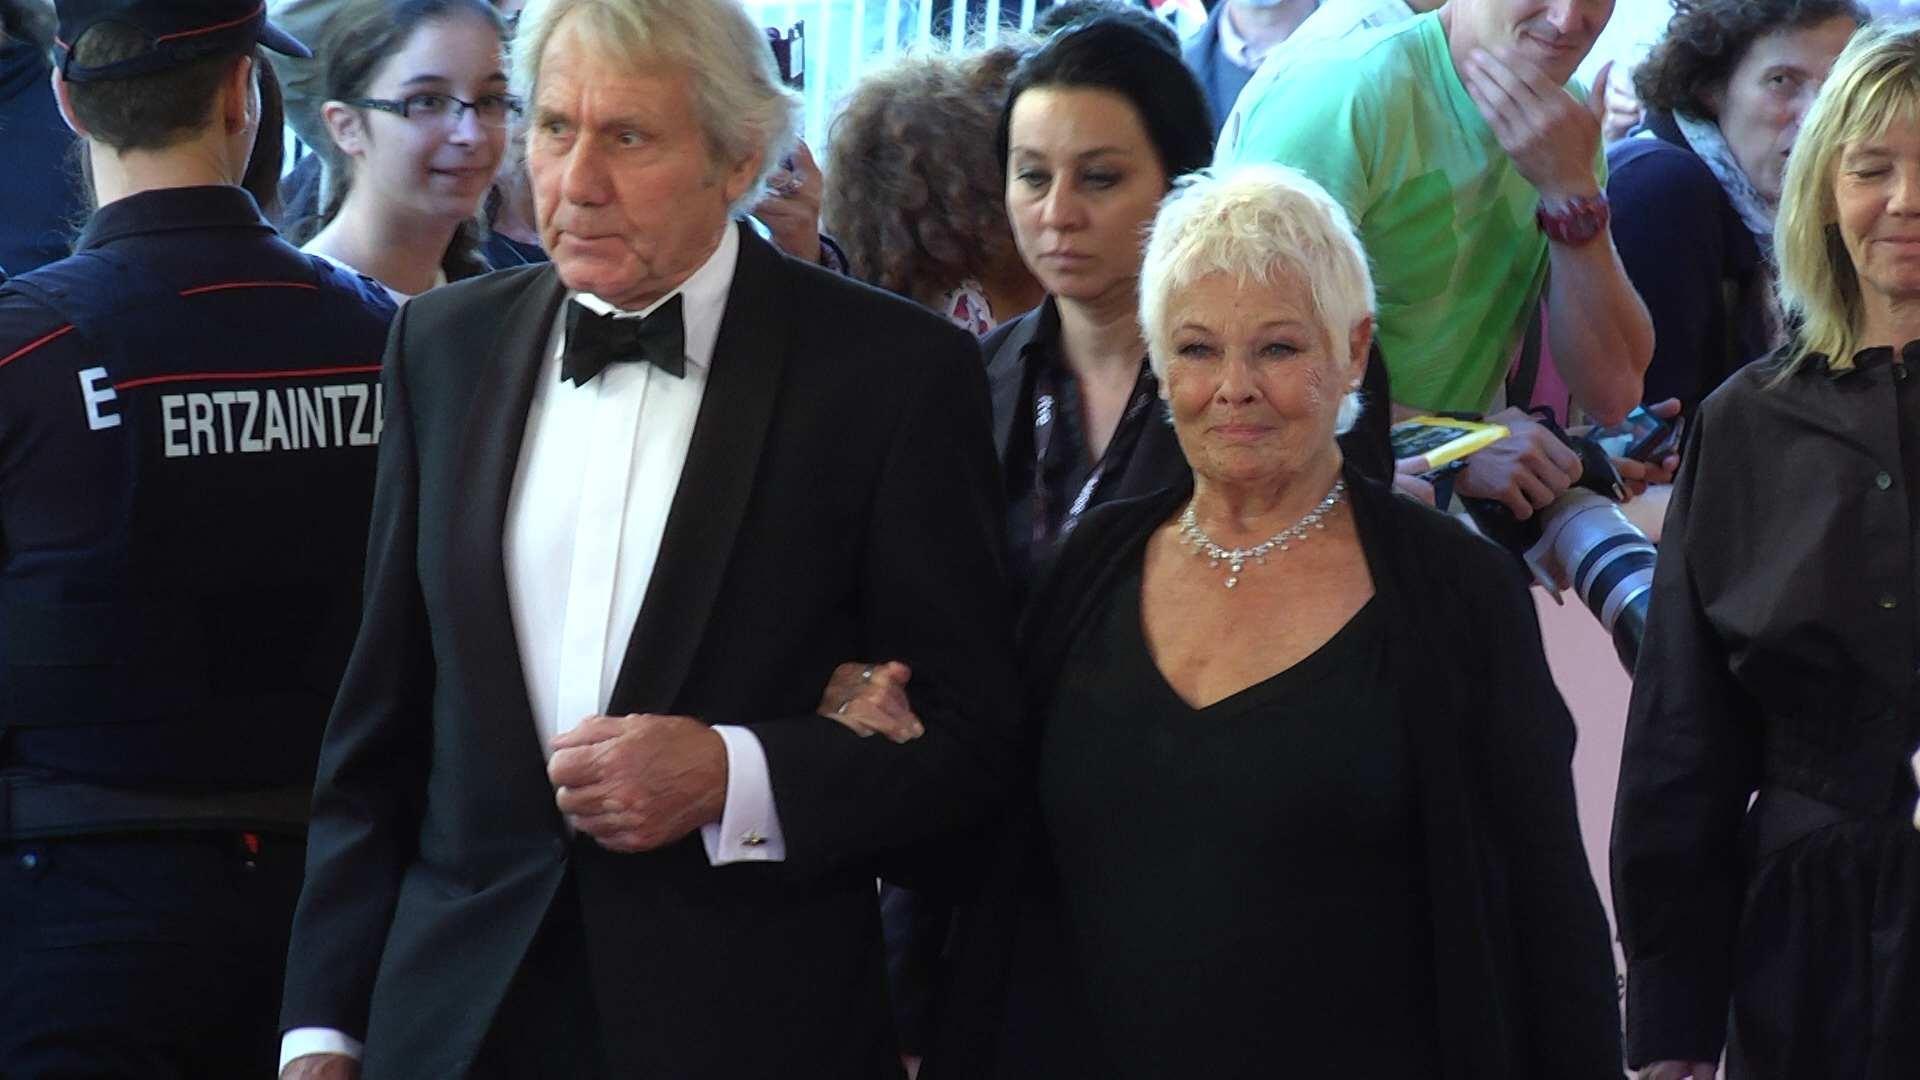 The 66th annual San Sebastian International Film Festival kicks off in Spain